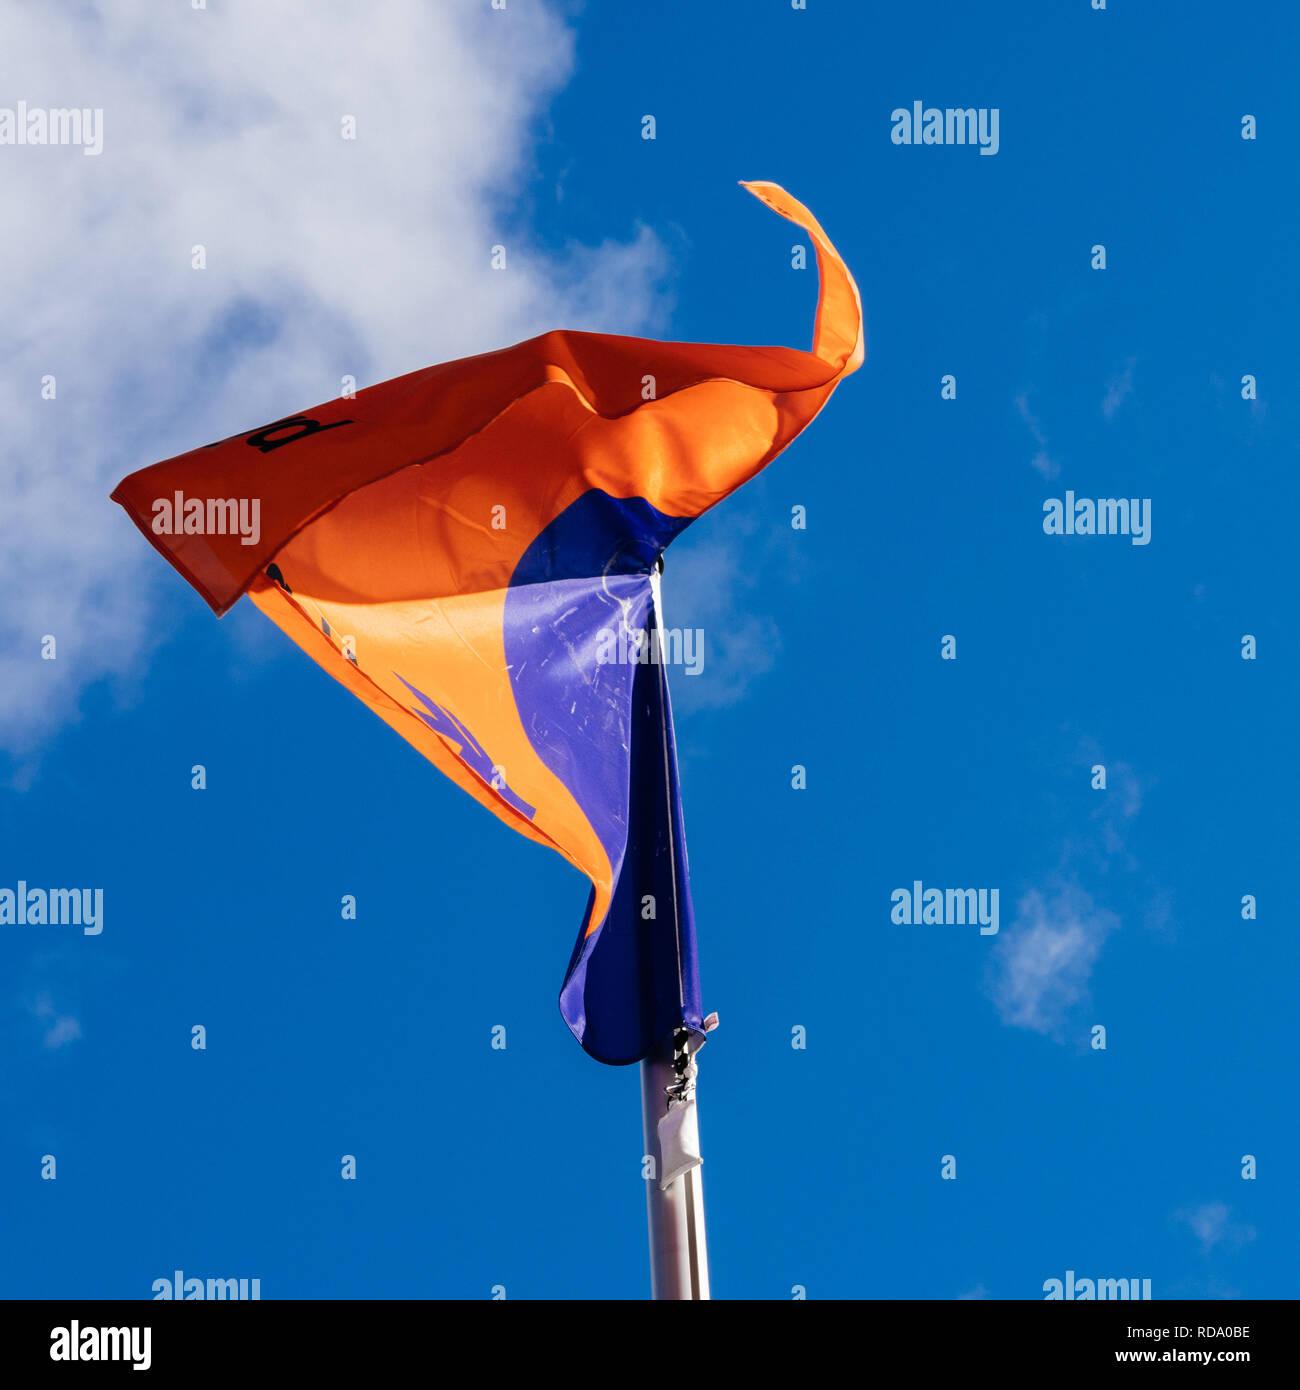 HAMBURG, GERMANY - MAR 20, 2018: Hapag-Lloyd transnational German-based transportation company flag waving against blue sky and white cloud - Stock Image